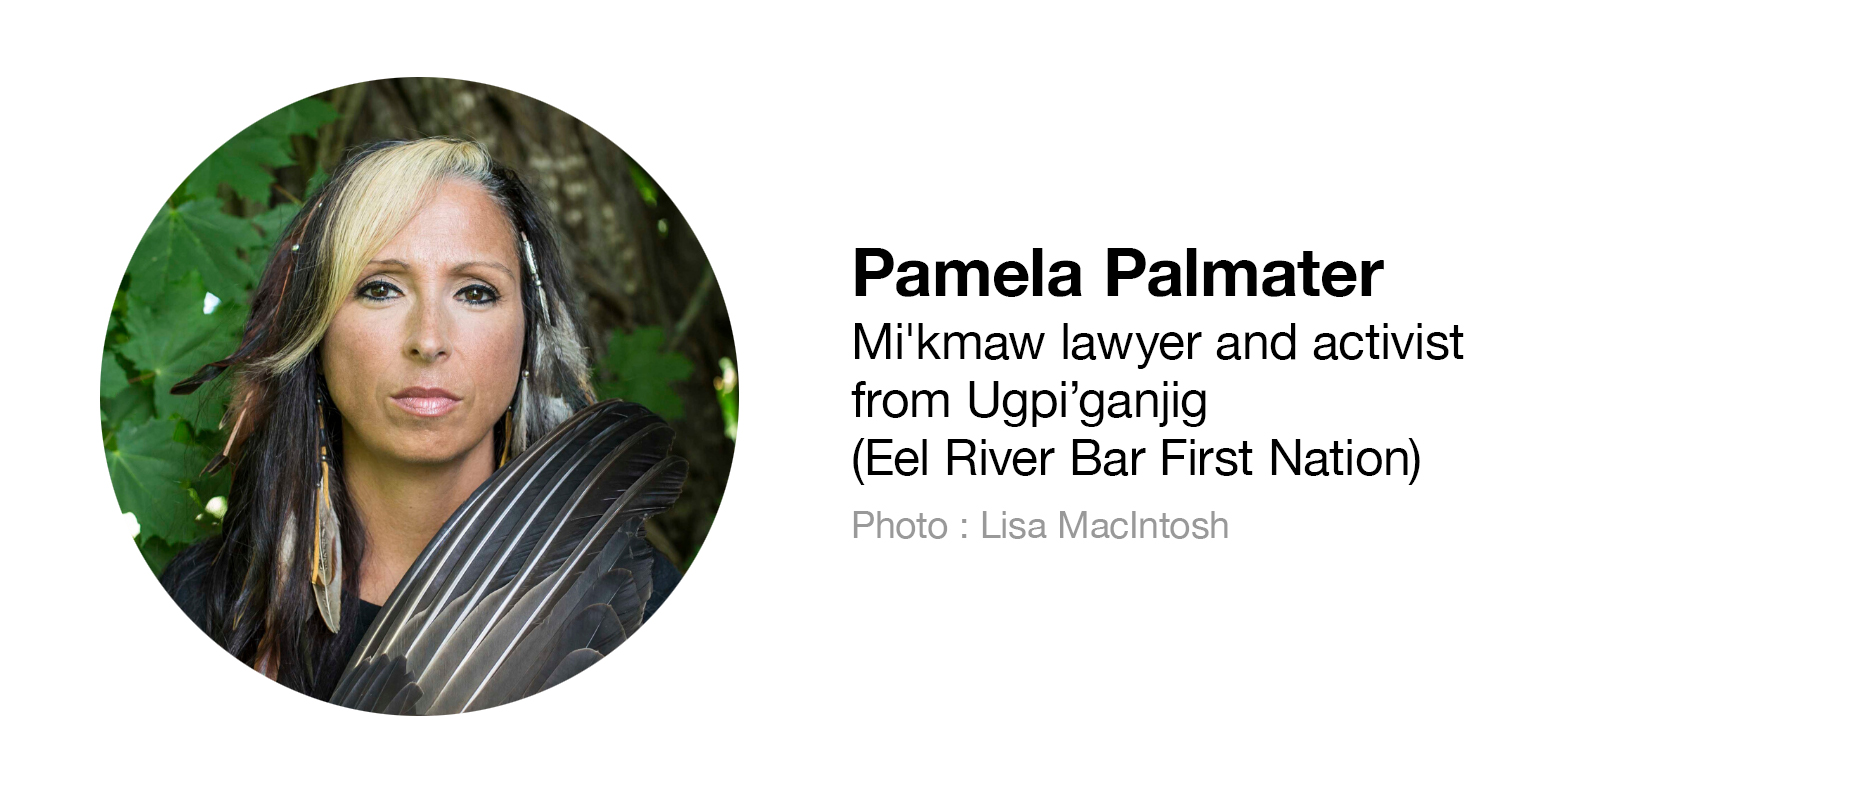 Mi'kmaw lawyer and activist from Ugpi'ganjig (Eel River Bar First Nation)